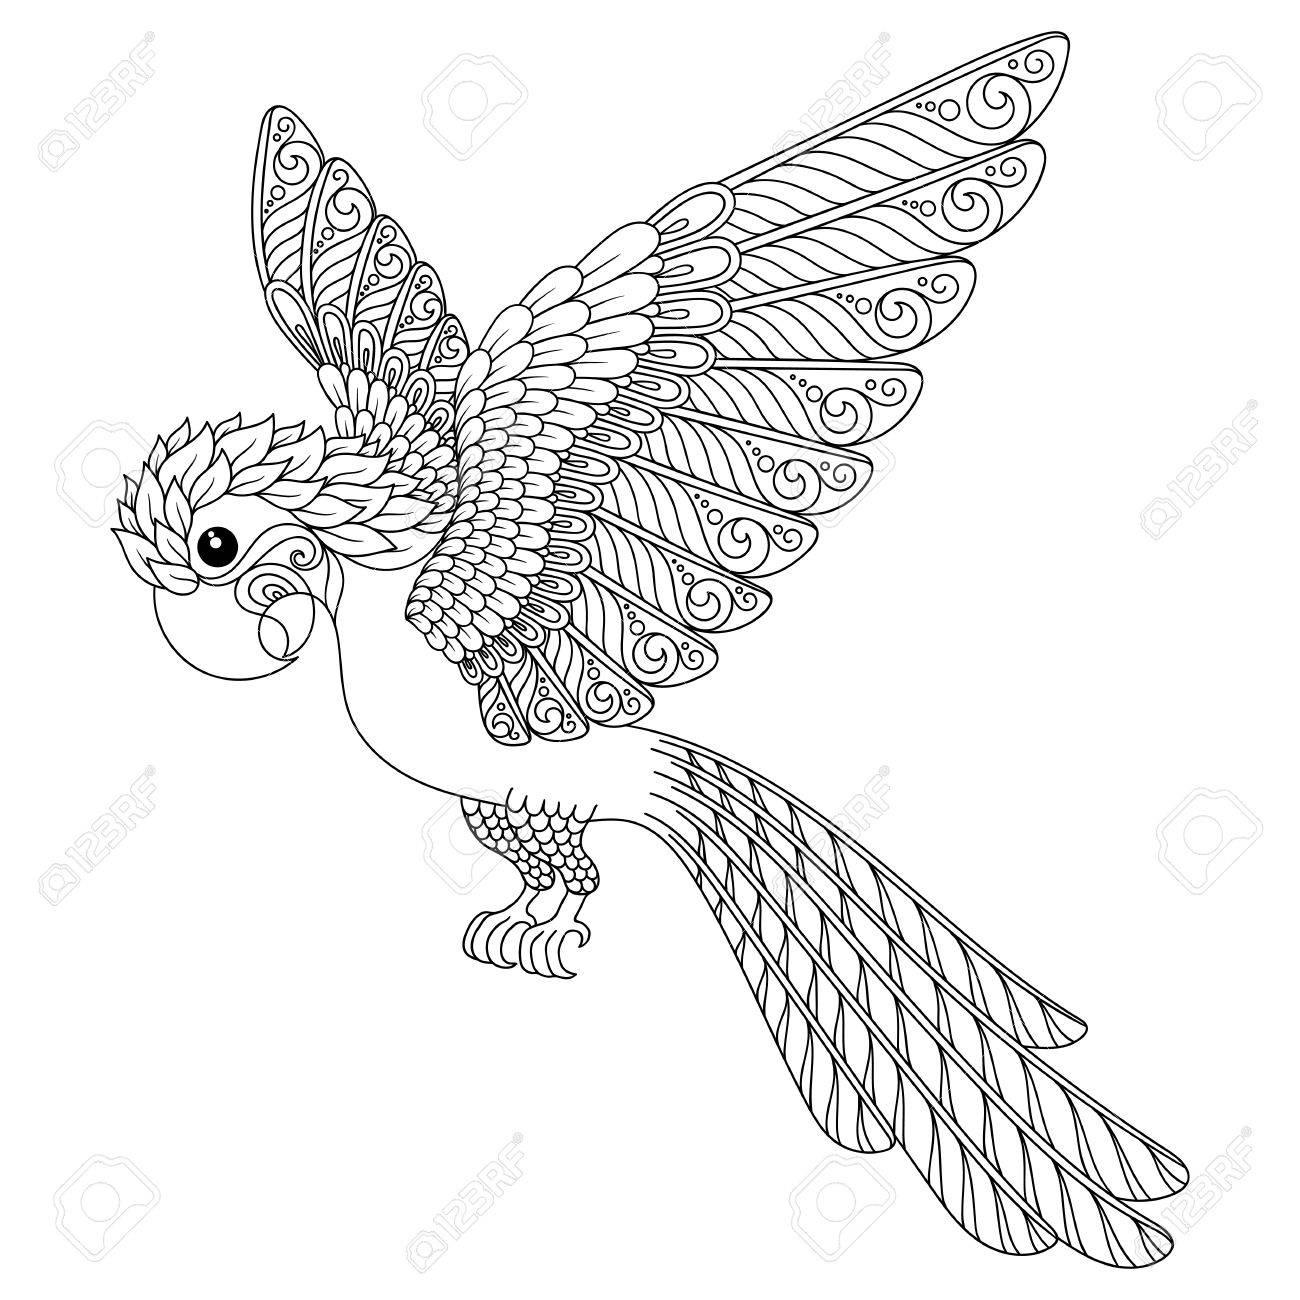 Coloriage Anti Stress Perroquet.Hand Drawn Perroquet Isole Sur Fond Transparent Anti Stress Coloriage Vector Monochrome Esquisse